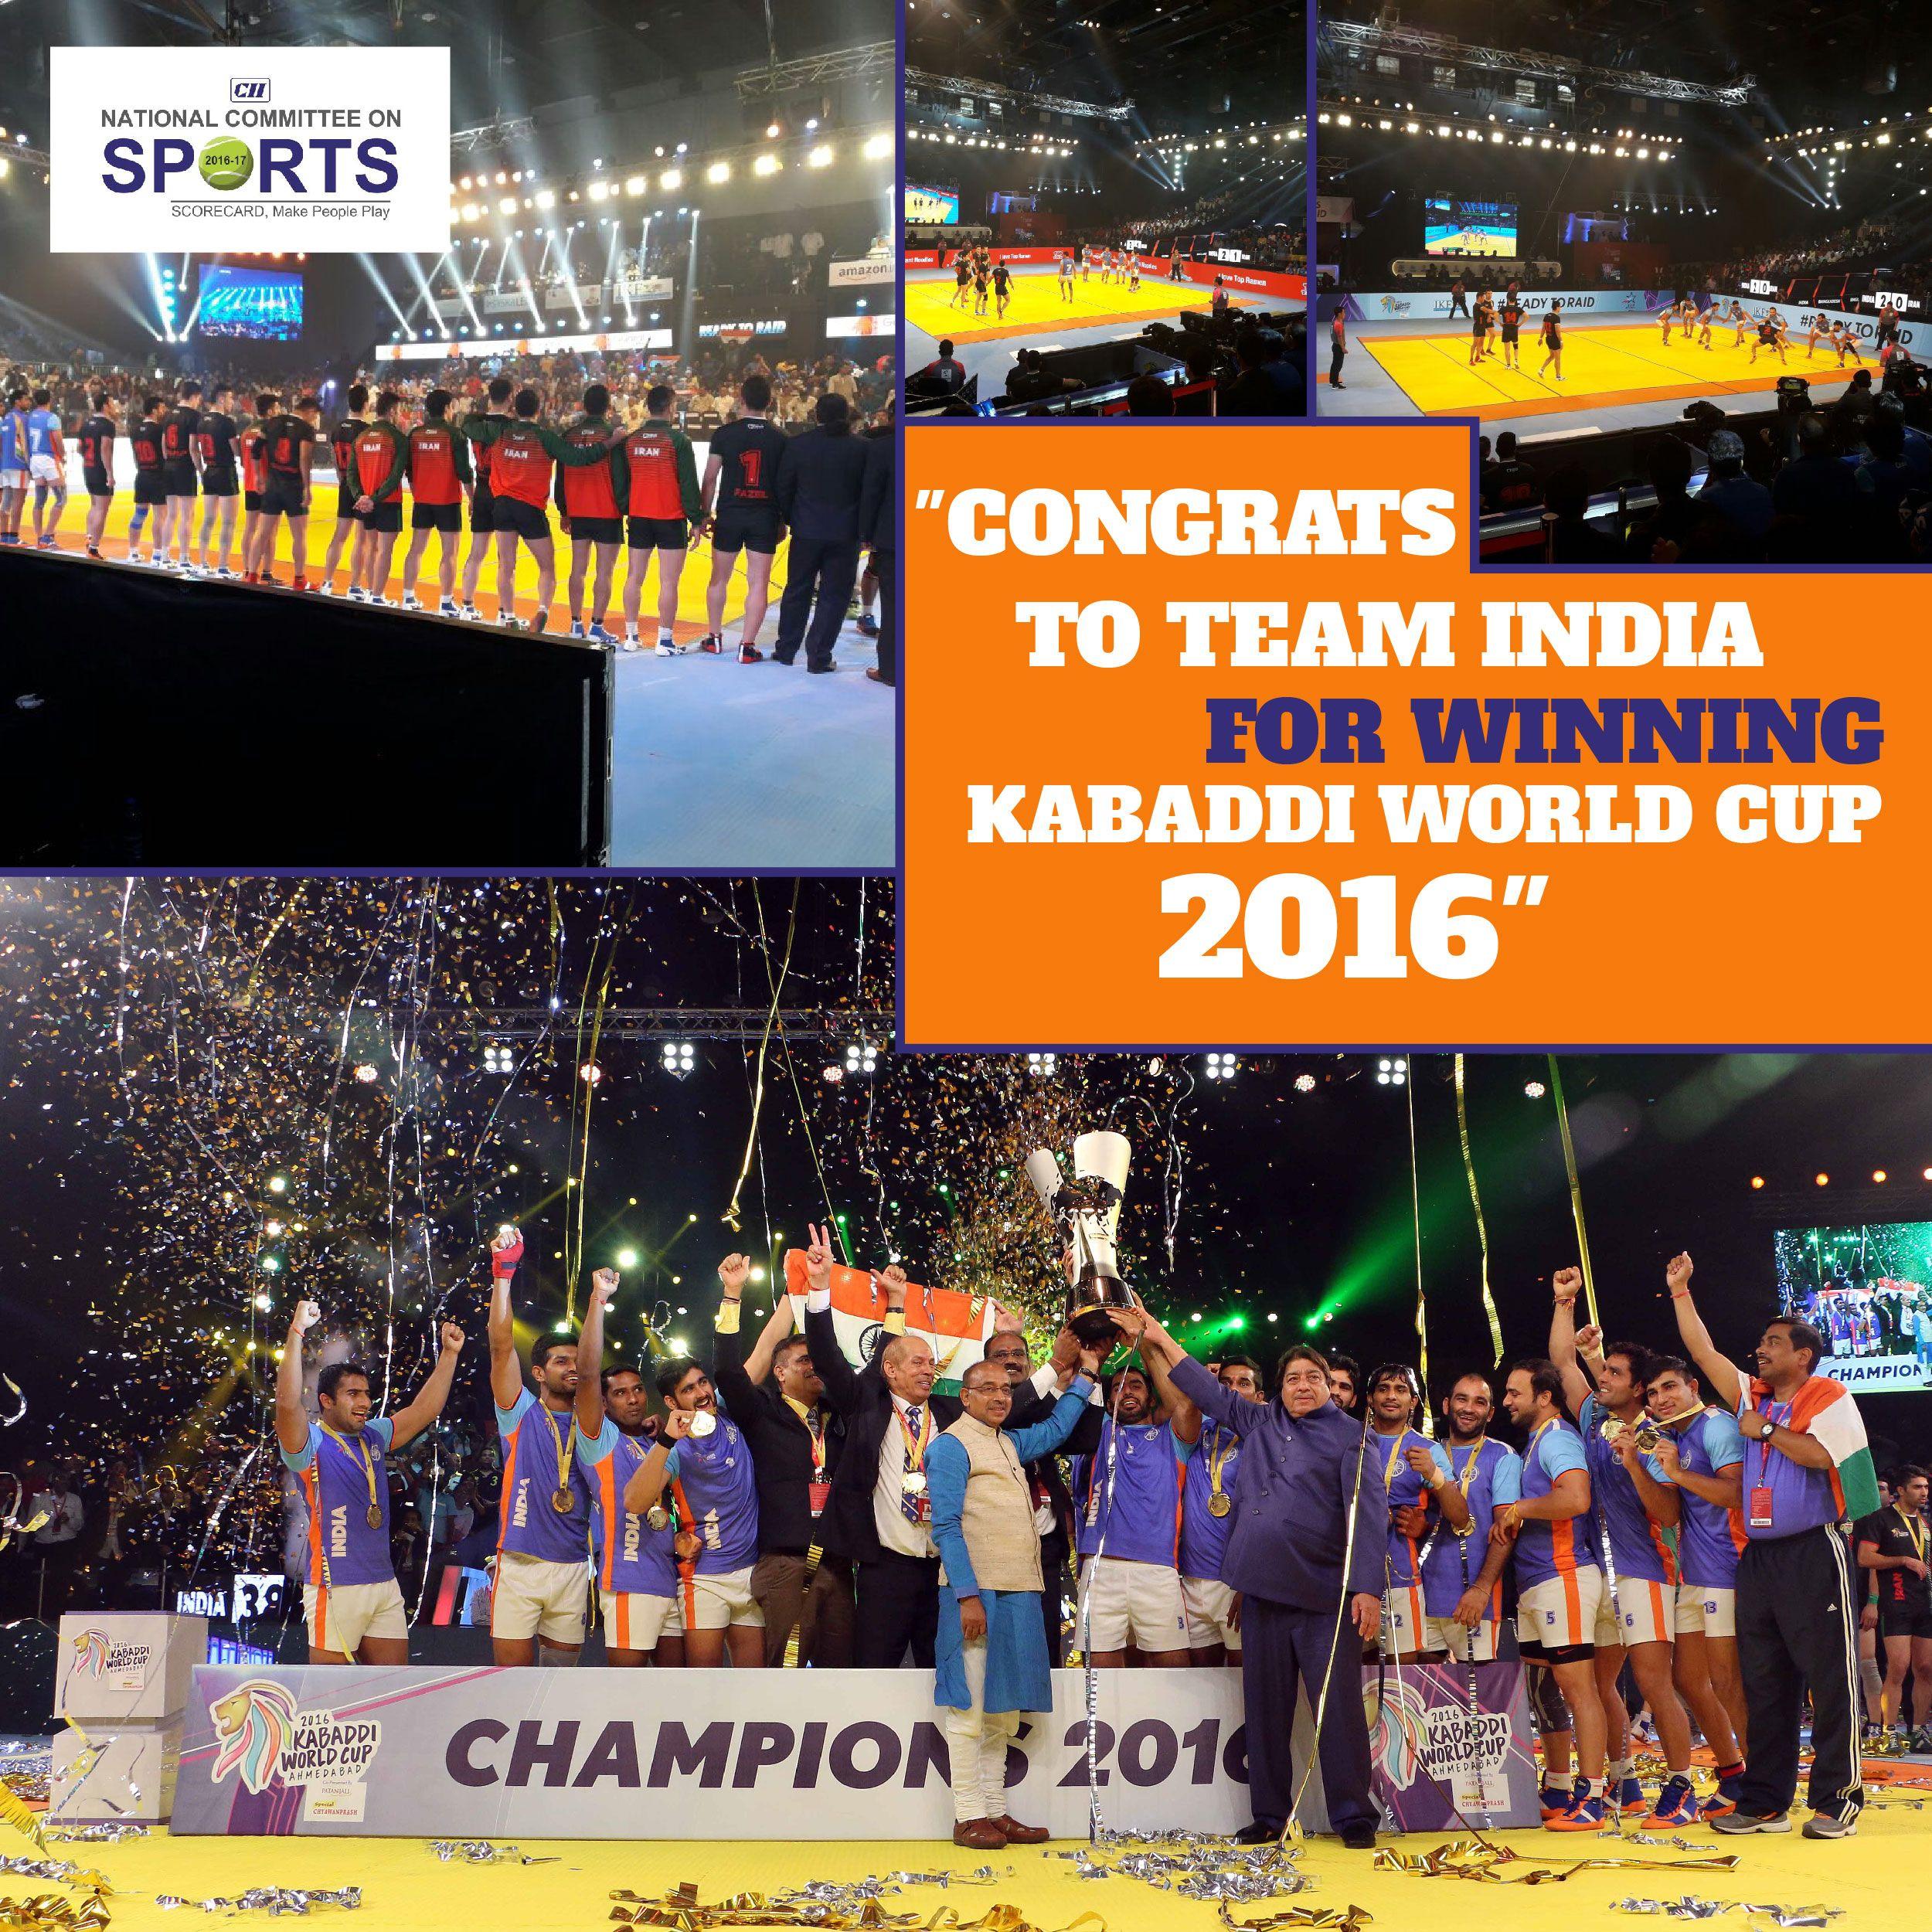 Congrats To Team India For Winning Kabaddiworldcup2016 Ciiscorecard Kabaddi World Cup Congrats World Cup